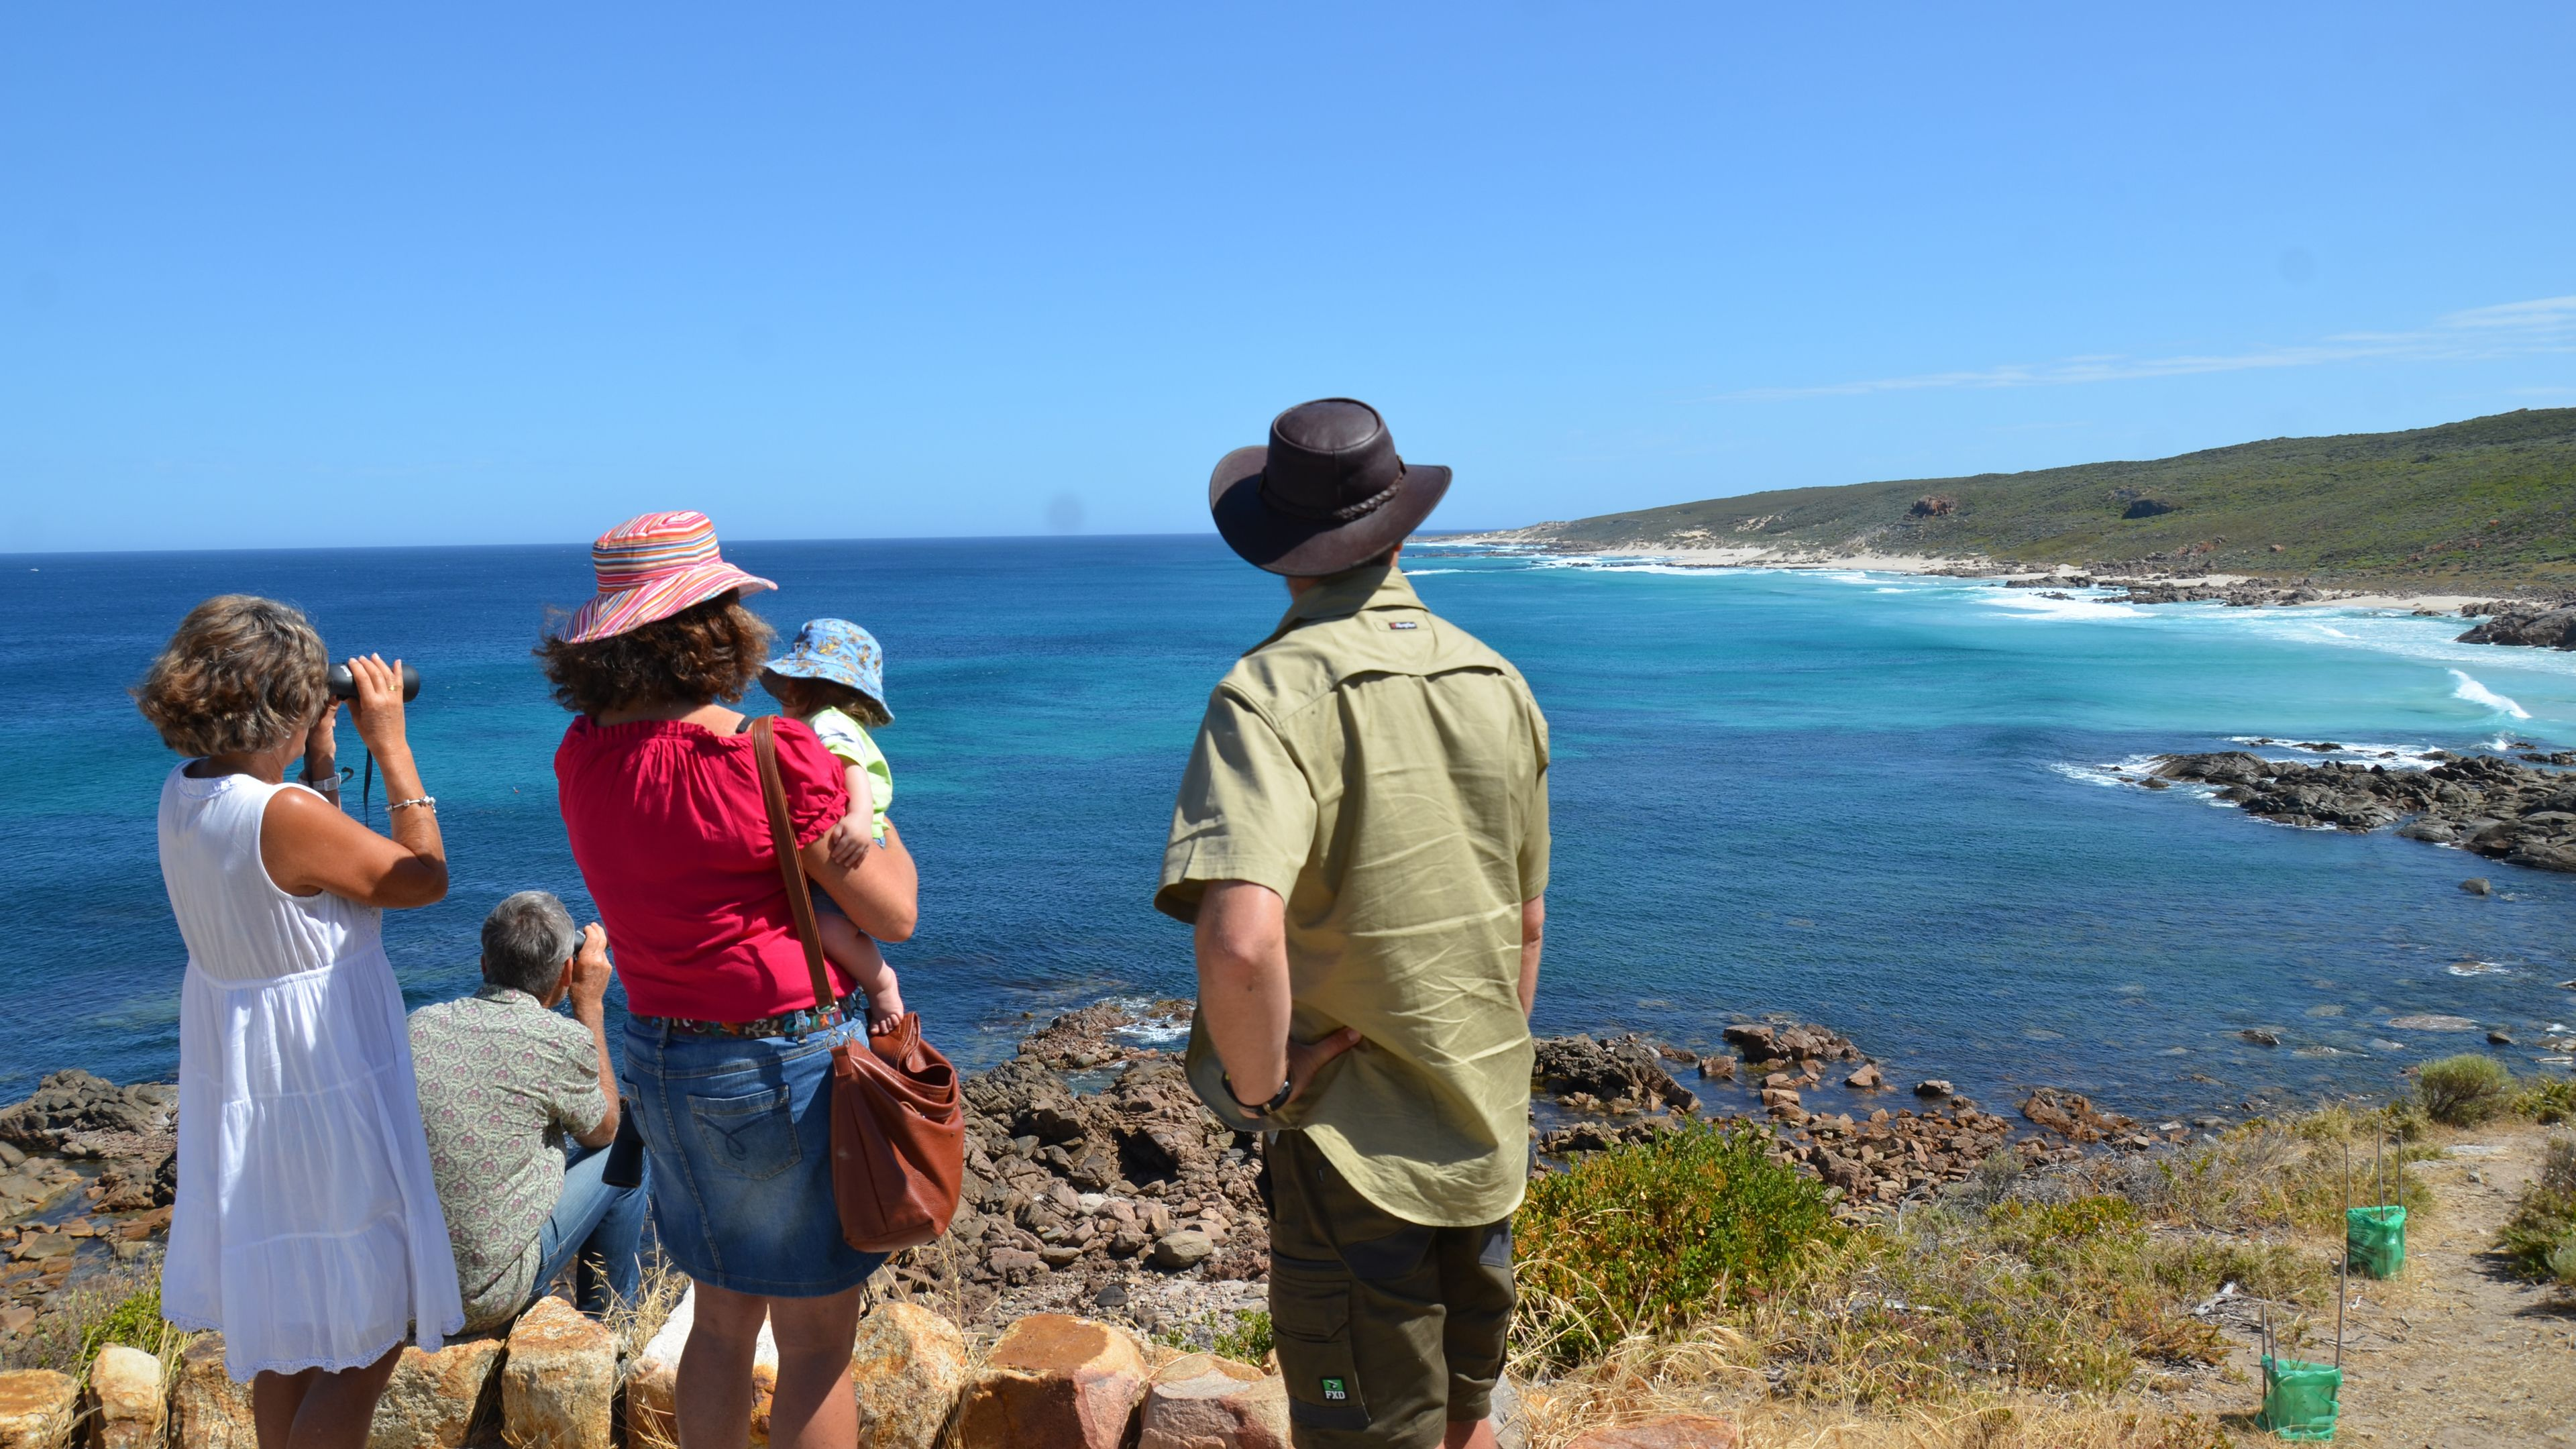 family enjoying view of ocean